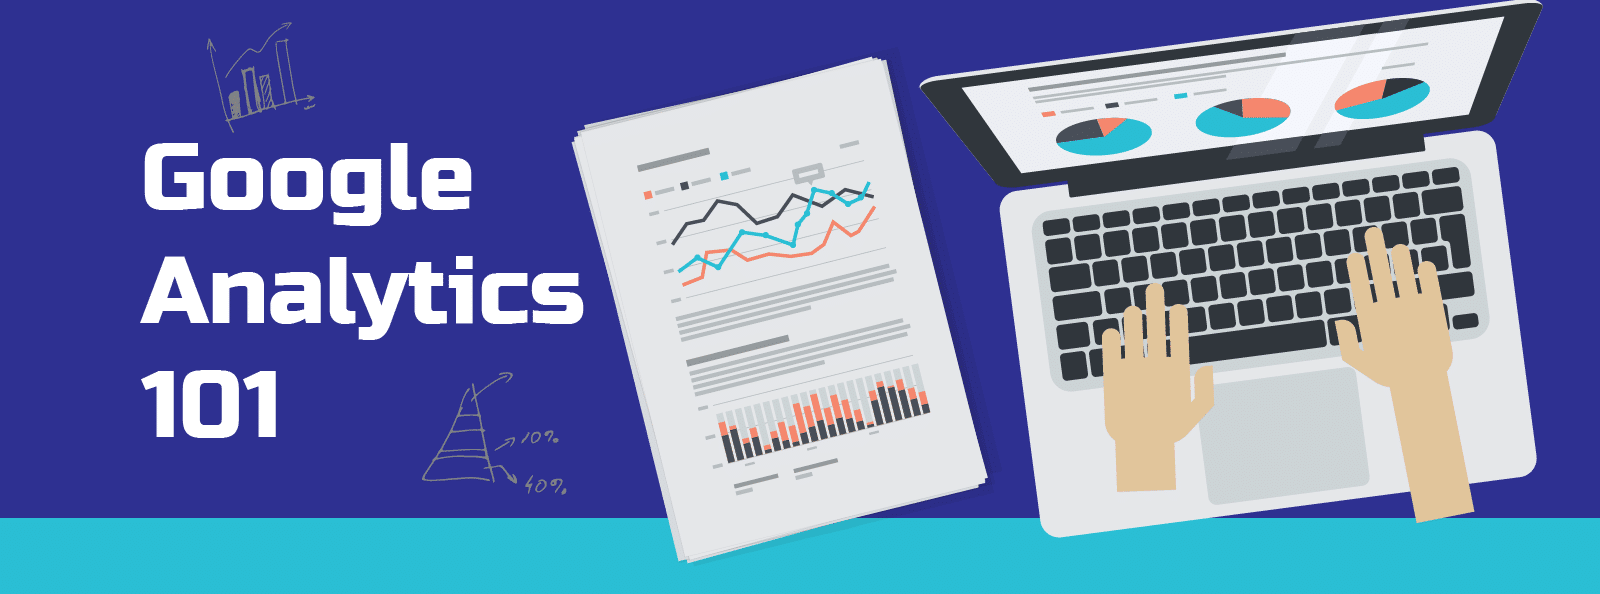 Google-Analytics-101-training-websites-1600x594